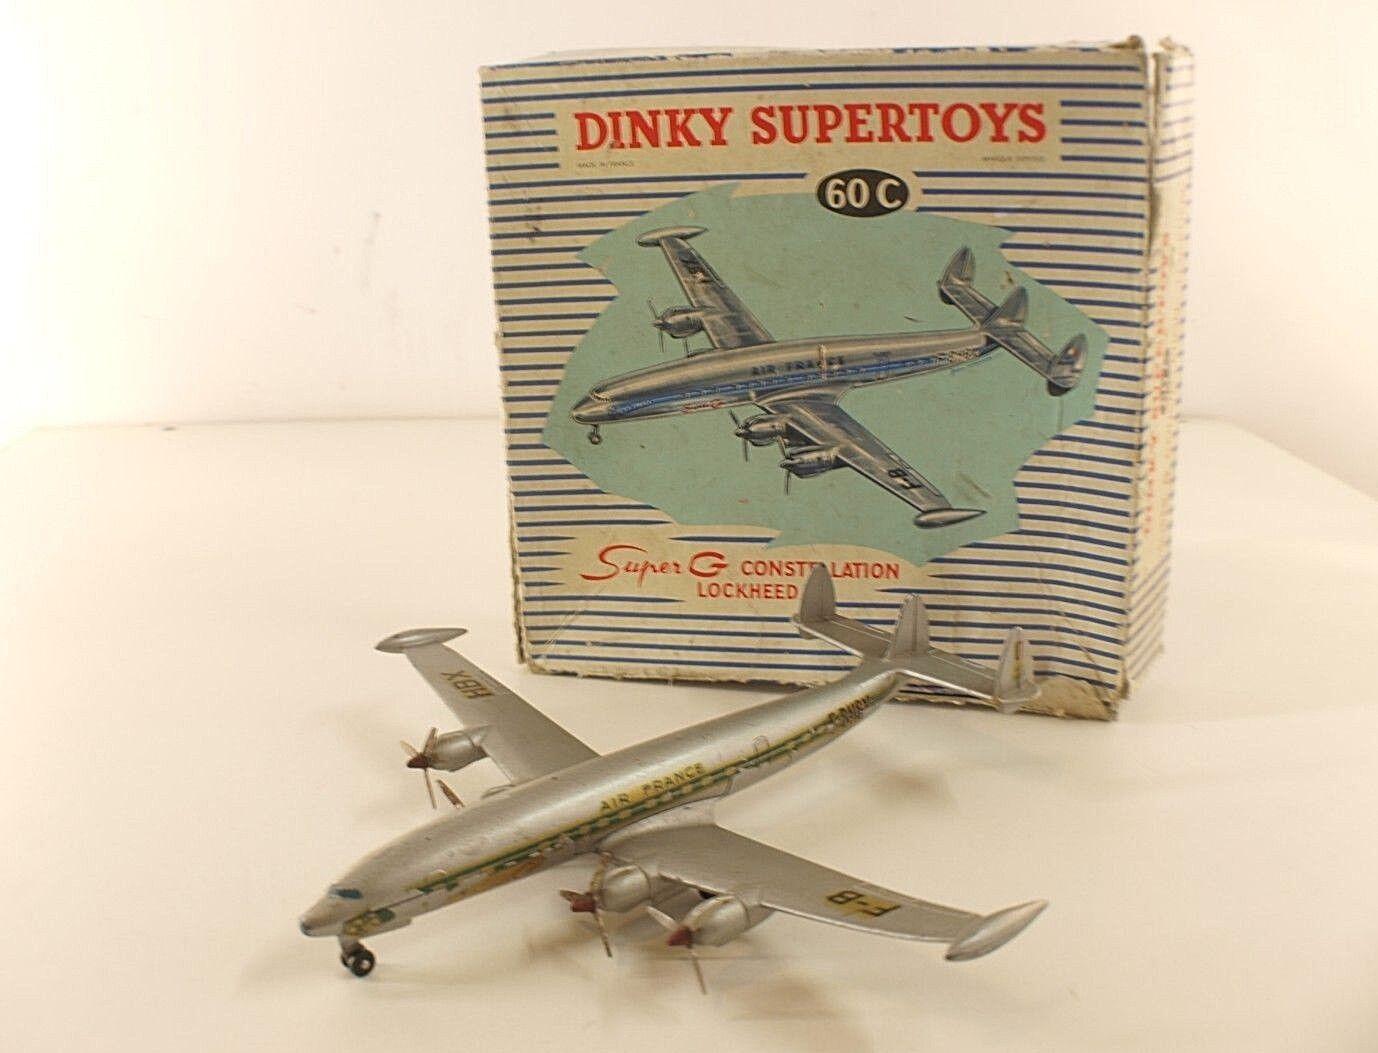 Dinky Spielzeugs F 60C avion super G Constellation Lockheed  Air France en boite